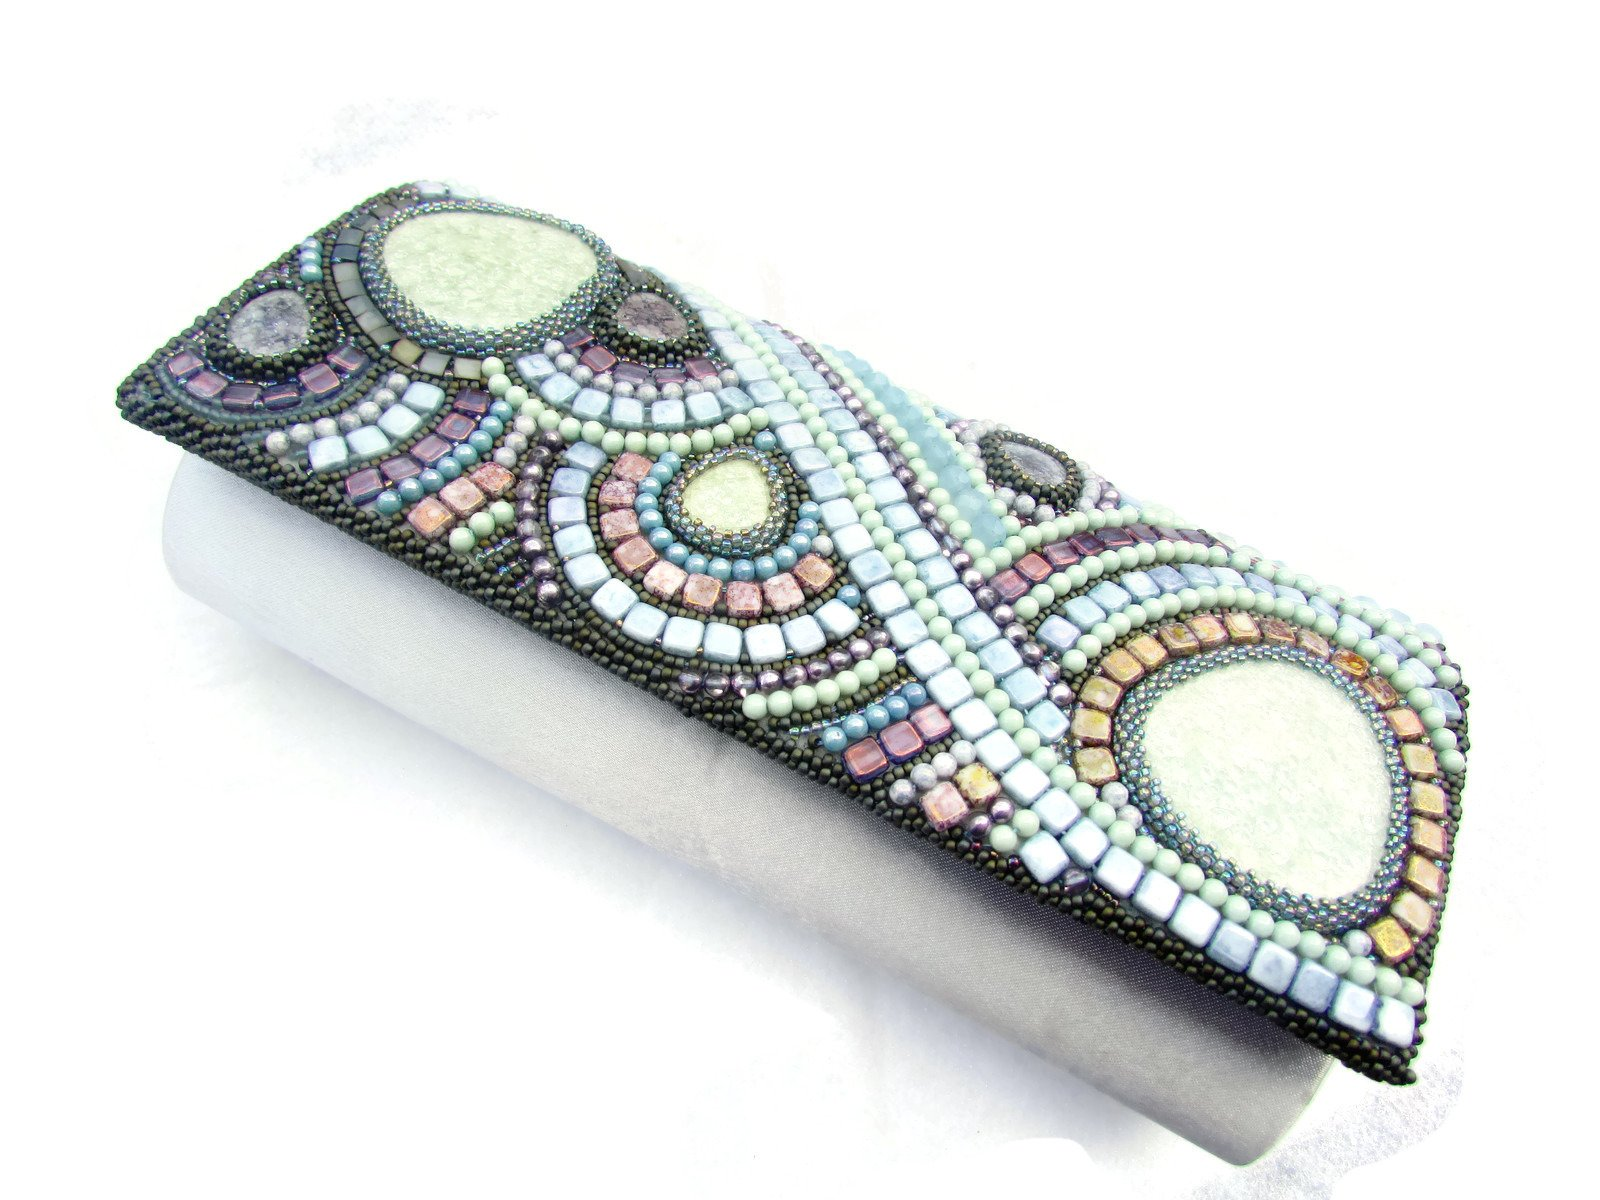 Original & unique multicolored handmade bead embroidered artisan jewelry purse handbag pouch clutch - Color universe